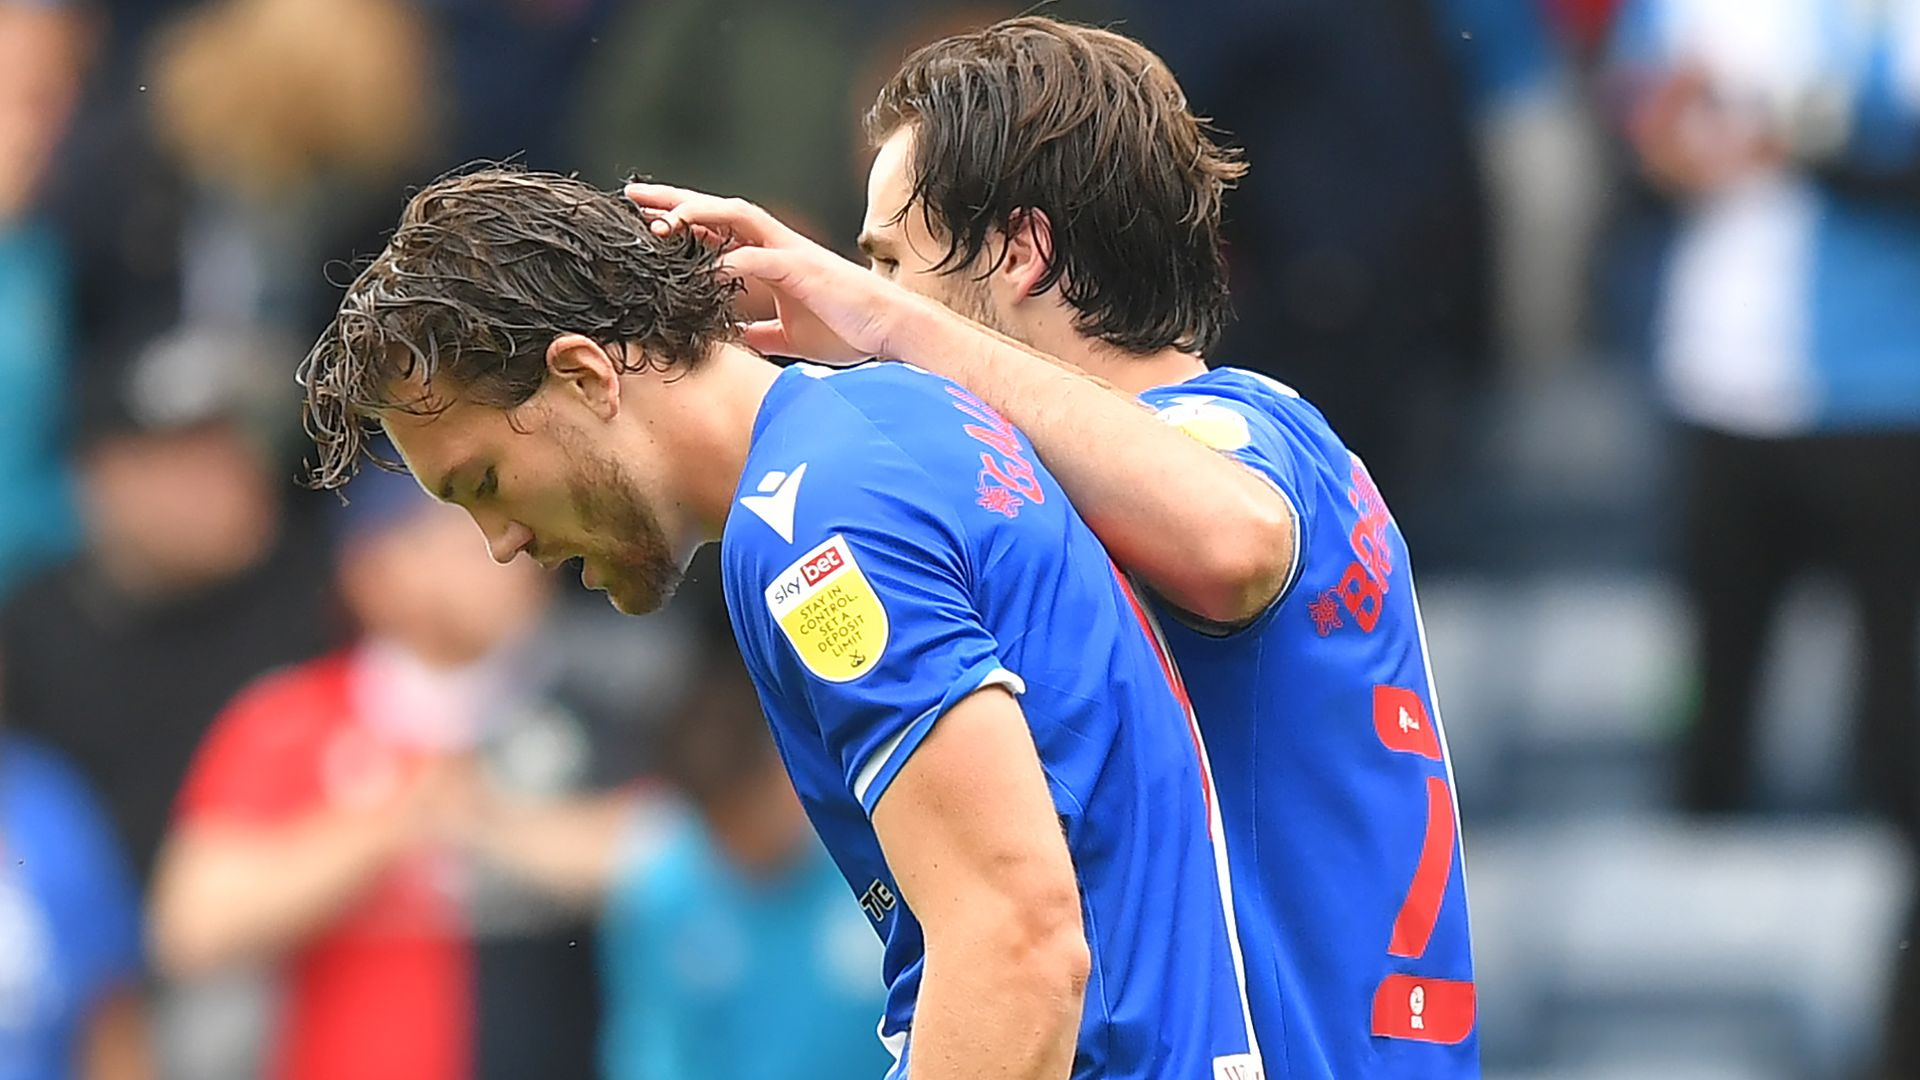 Swansea beaten by Blackburn in Martin's first game